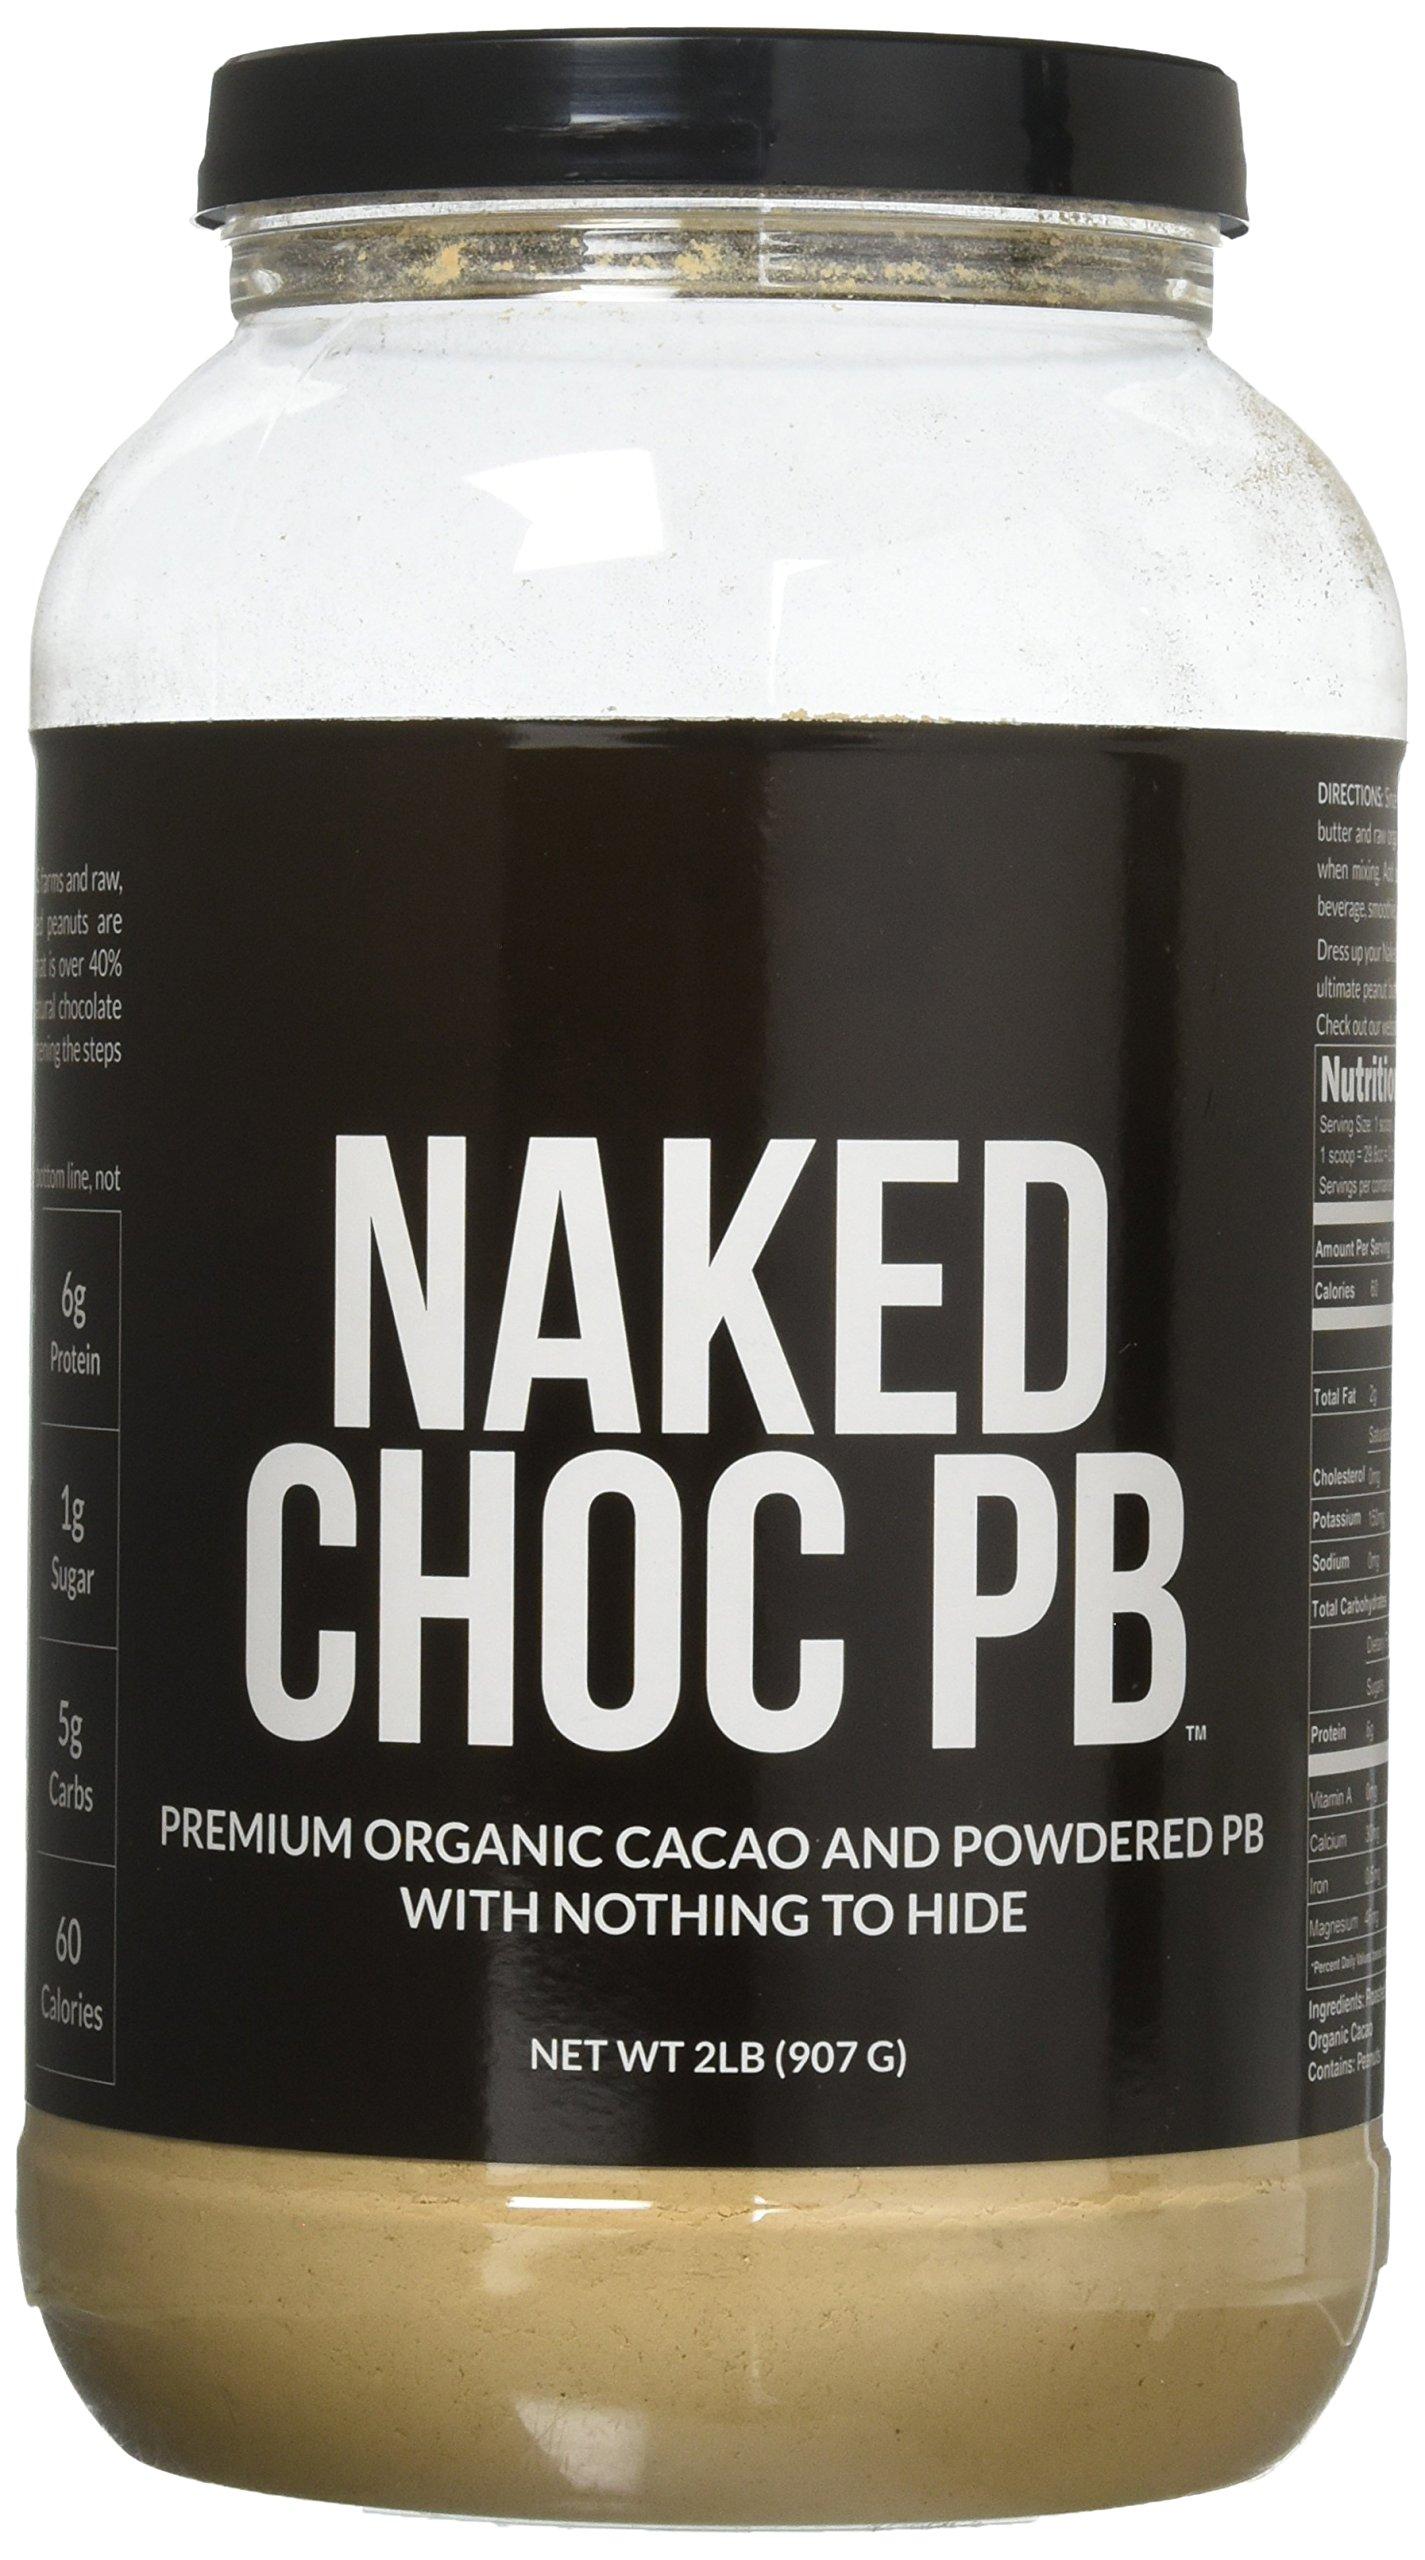 NAKED CHOC PB - Premium Organic Cacao and Powdered PB - 2lb Bulk